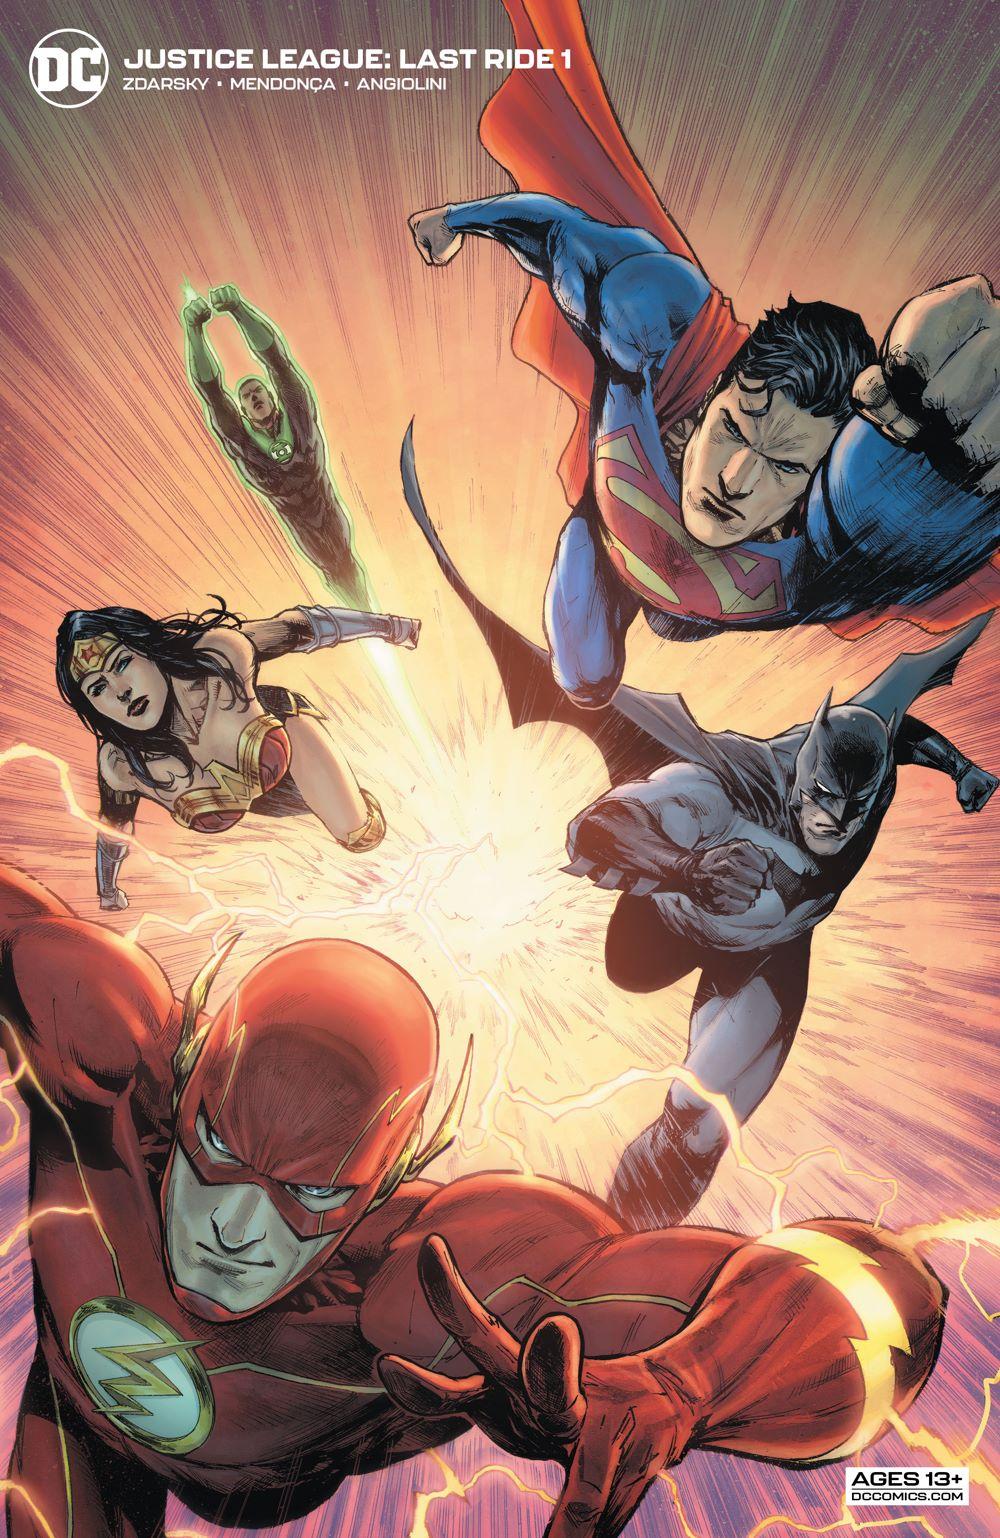 Justice-League-Last-Ride-1-2_60935bea02f861.40575894 ComicList Previews: JUSTICE LEAGUE LAST RIDE #1